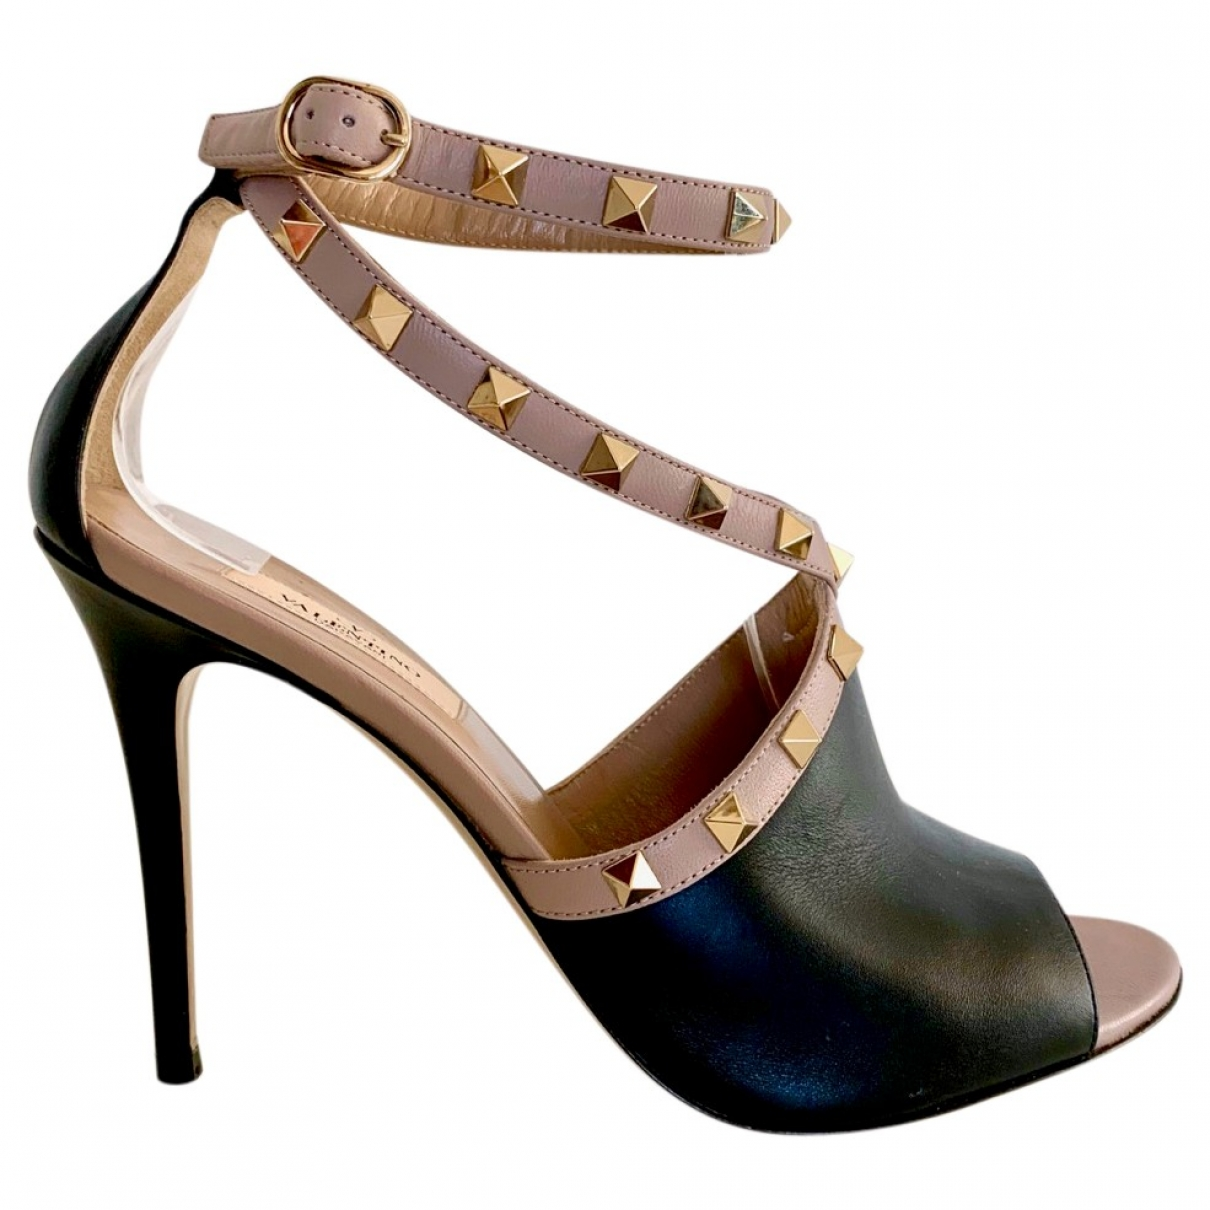 Valentino Garavani Rockstud Black Leather Sandals for Women 38.5 IT